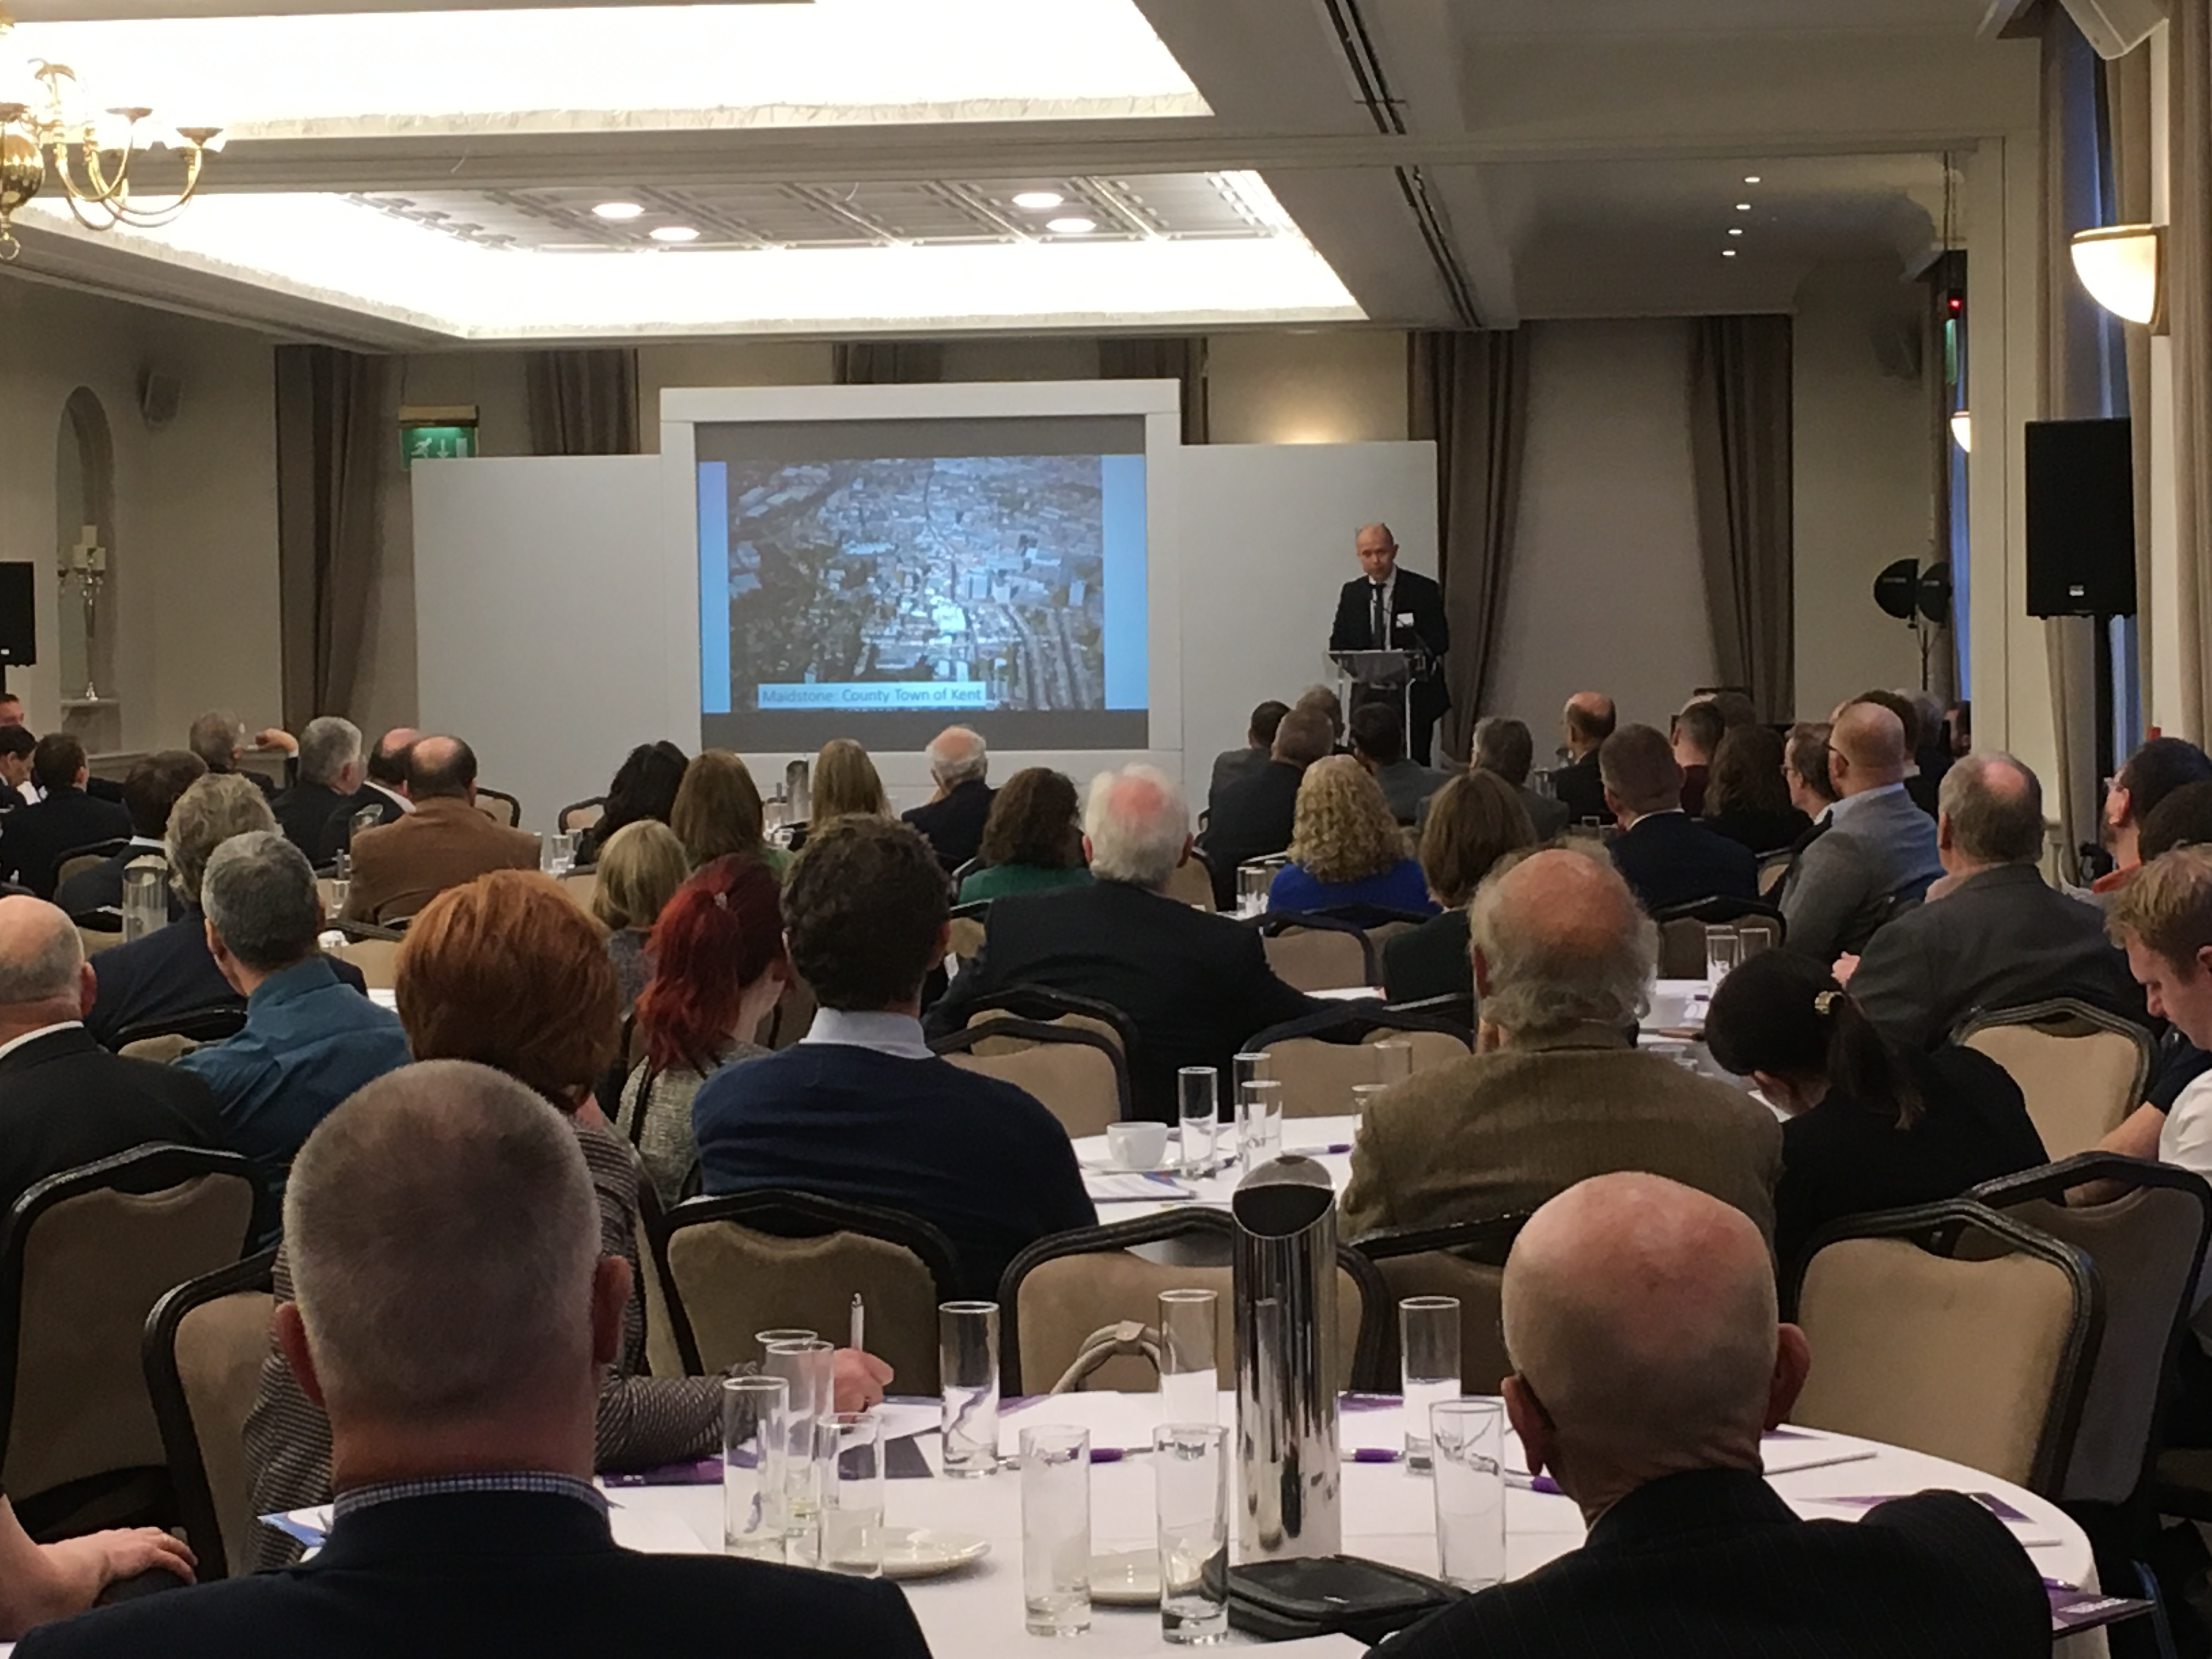 Maidstone Business Forum